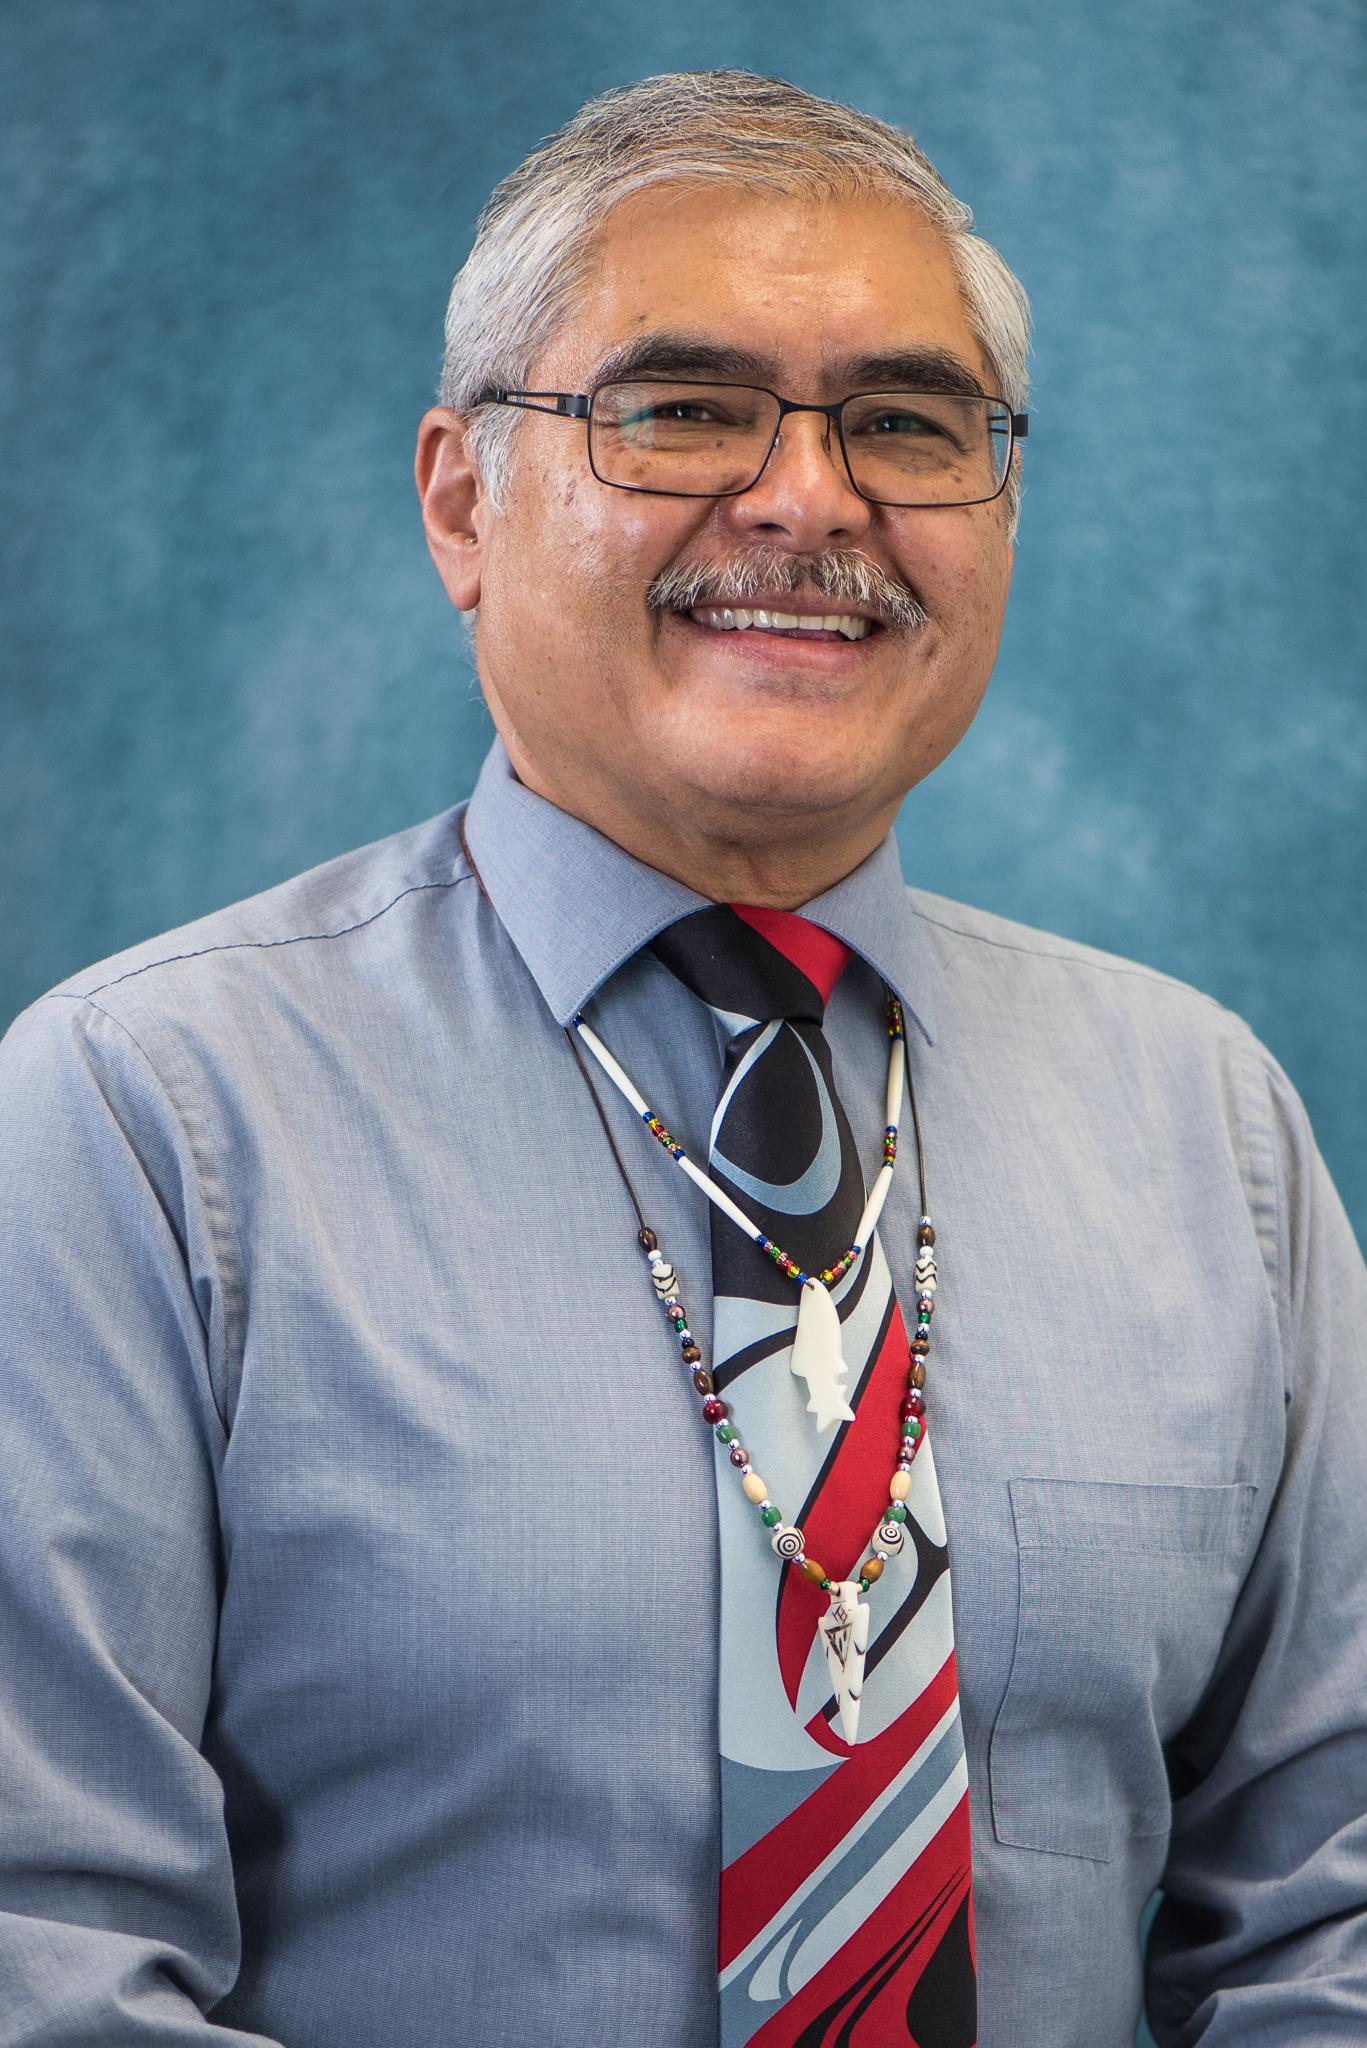 Chairman Robert de los Angeles, Snoqualmie Indian Tribe